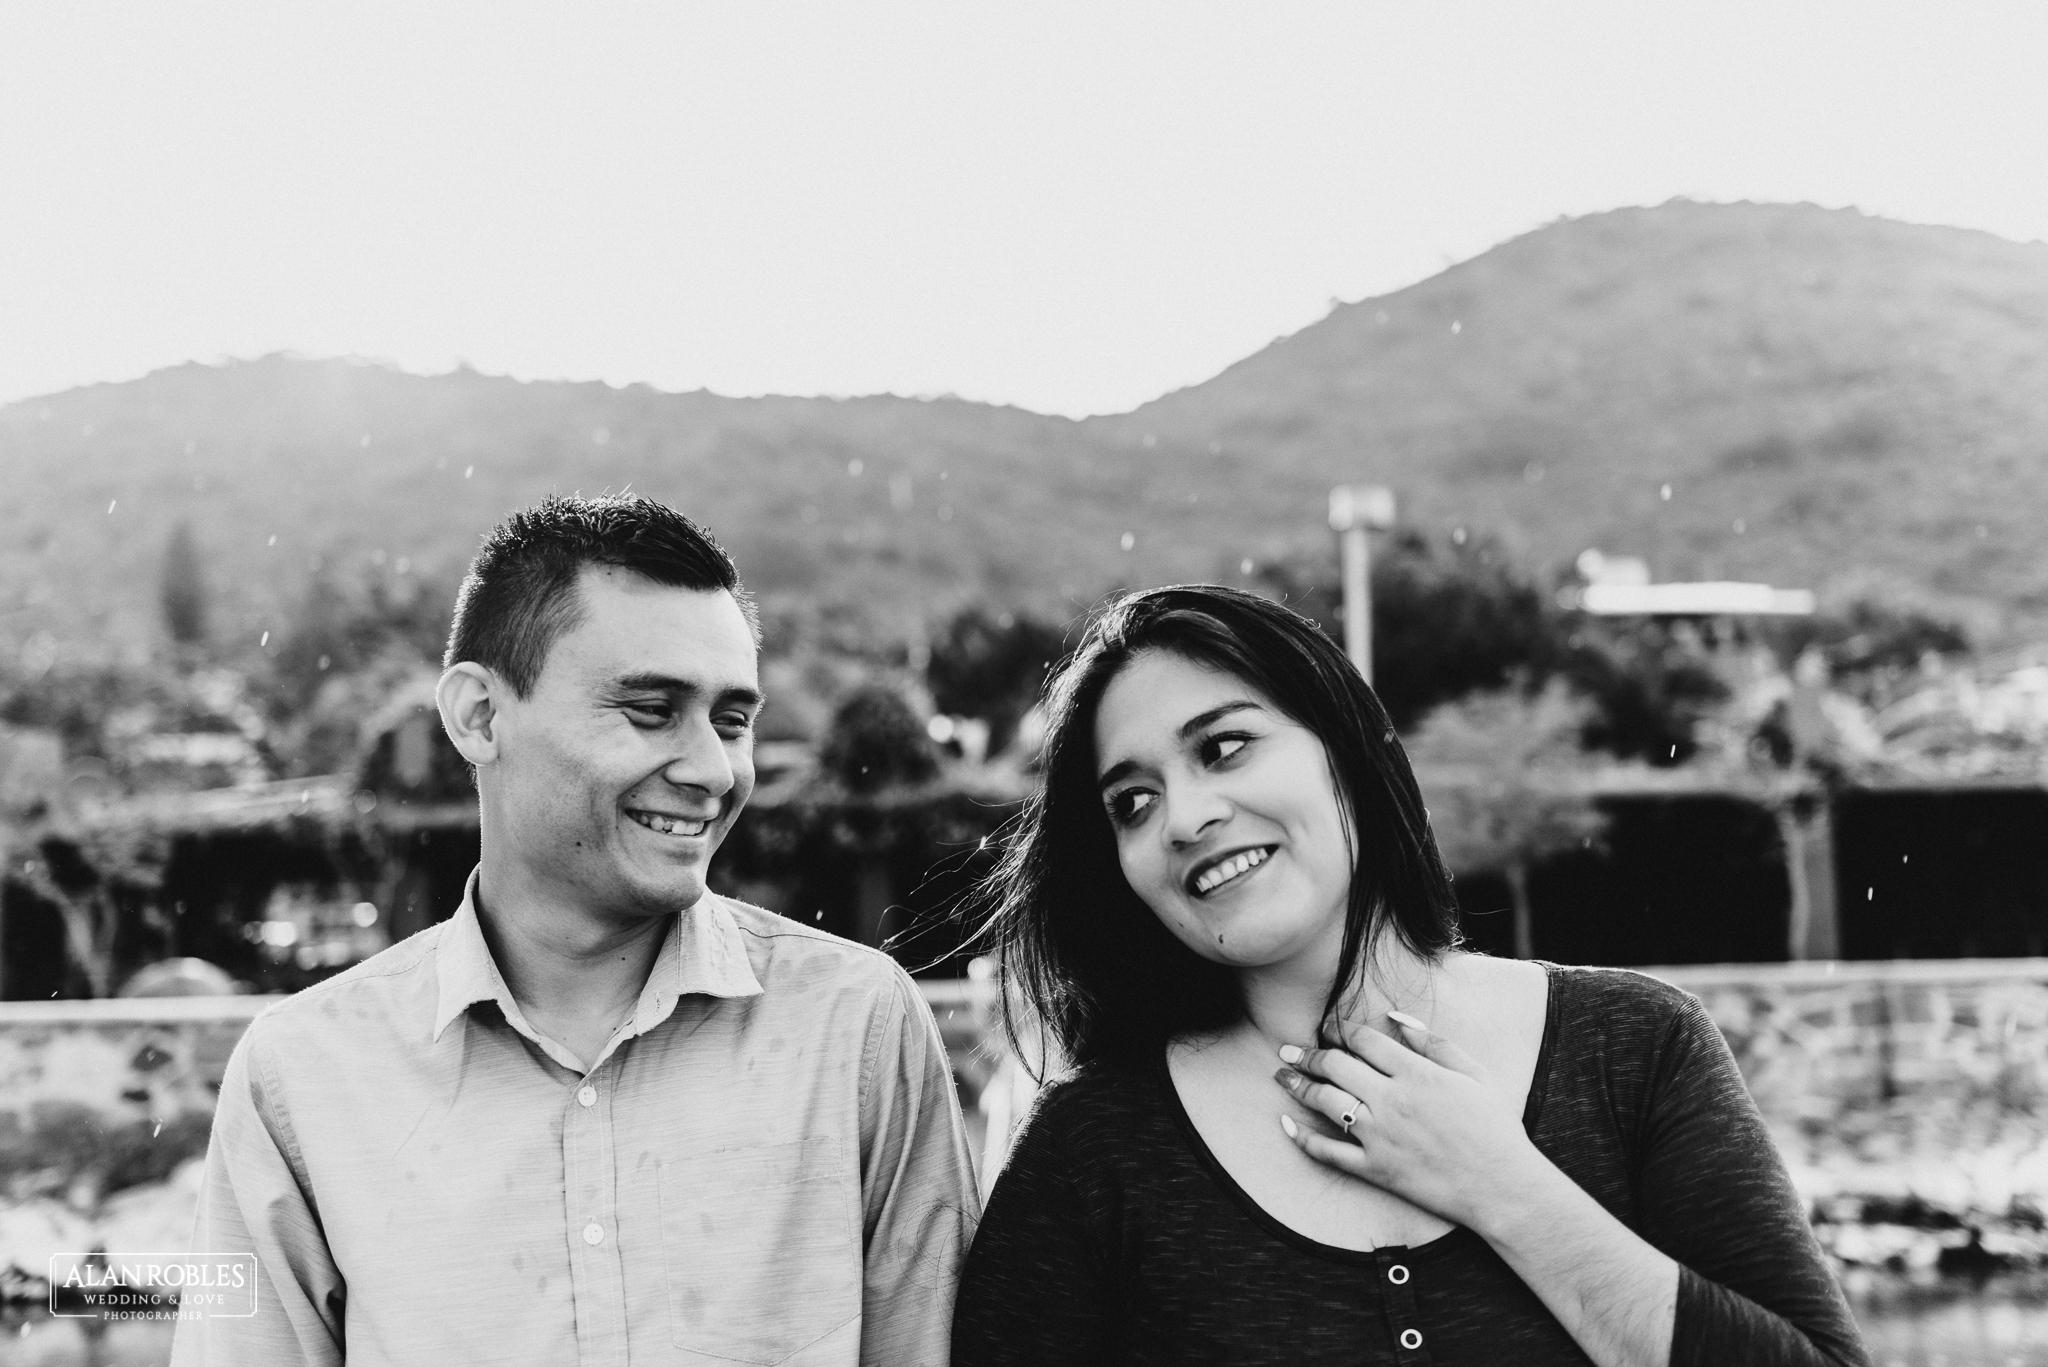 Sesion de fotos Preboda en Laguna de Cajititlan. Fotografia de bodas - Alan Robles Wedding & Love Photographer, Fotografo de bodas en Guadalajara. Fotografia Blanco y negro. Anillo de compromiso.